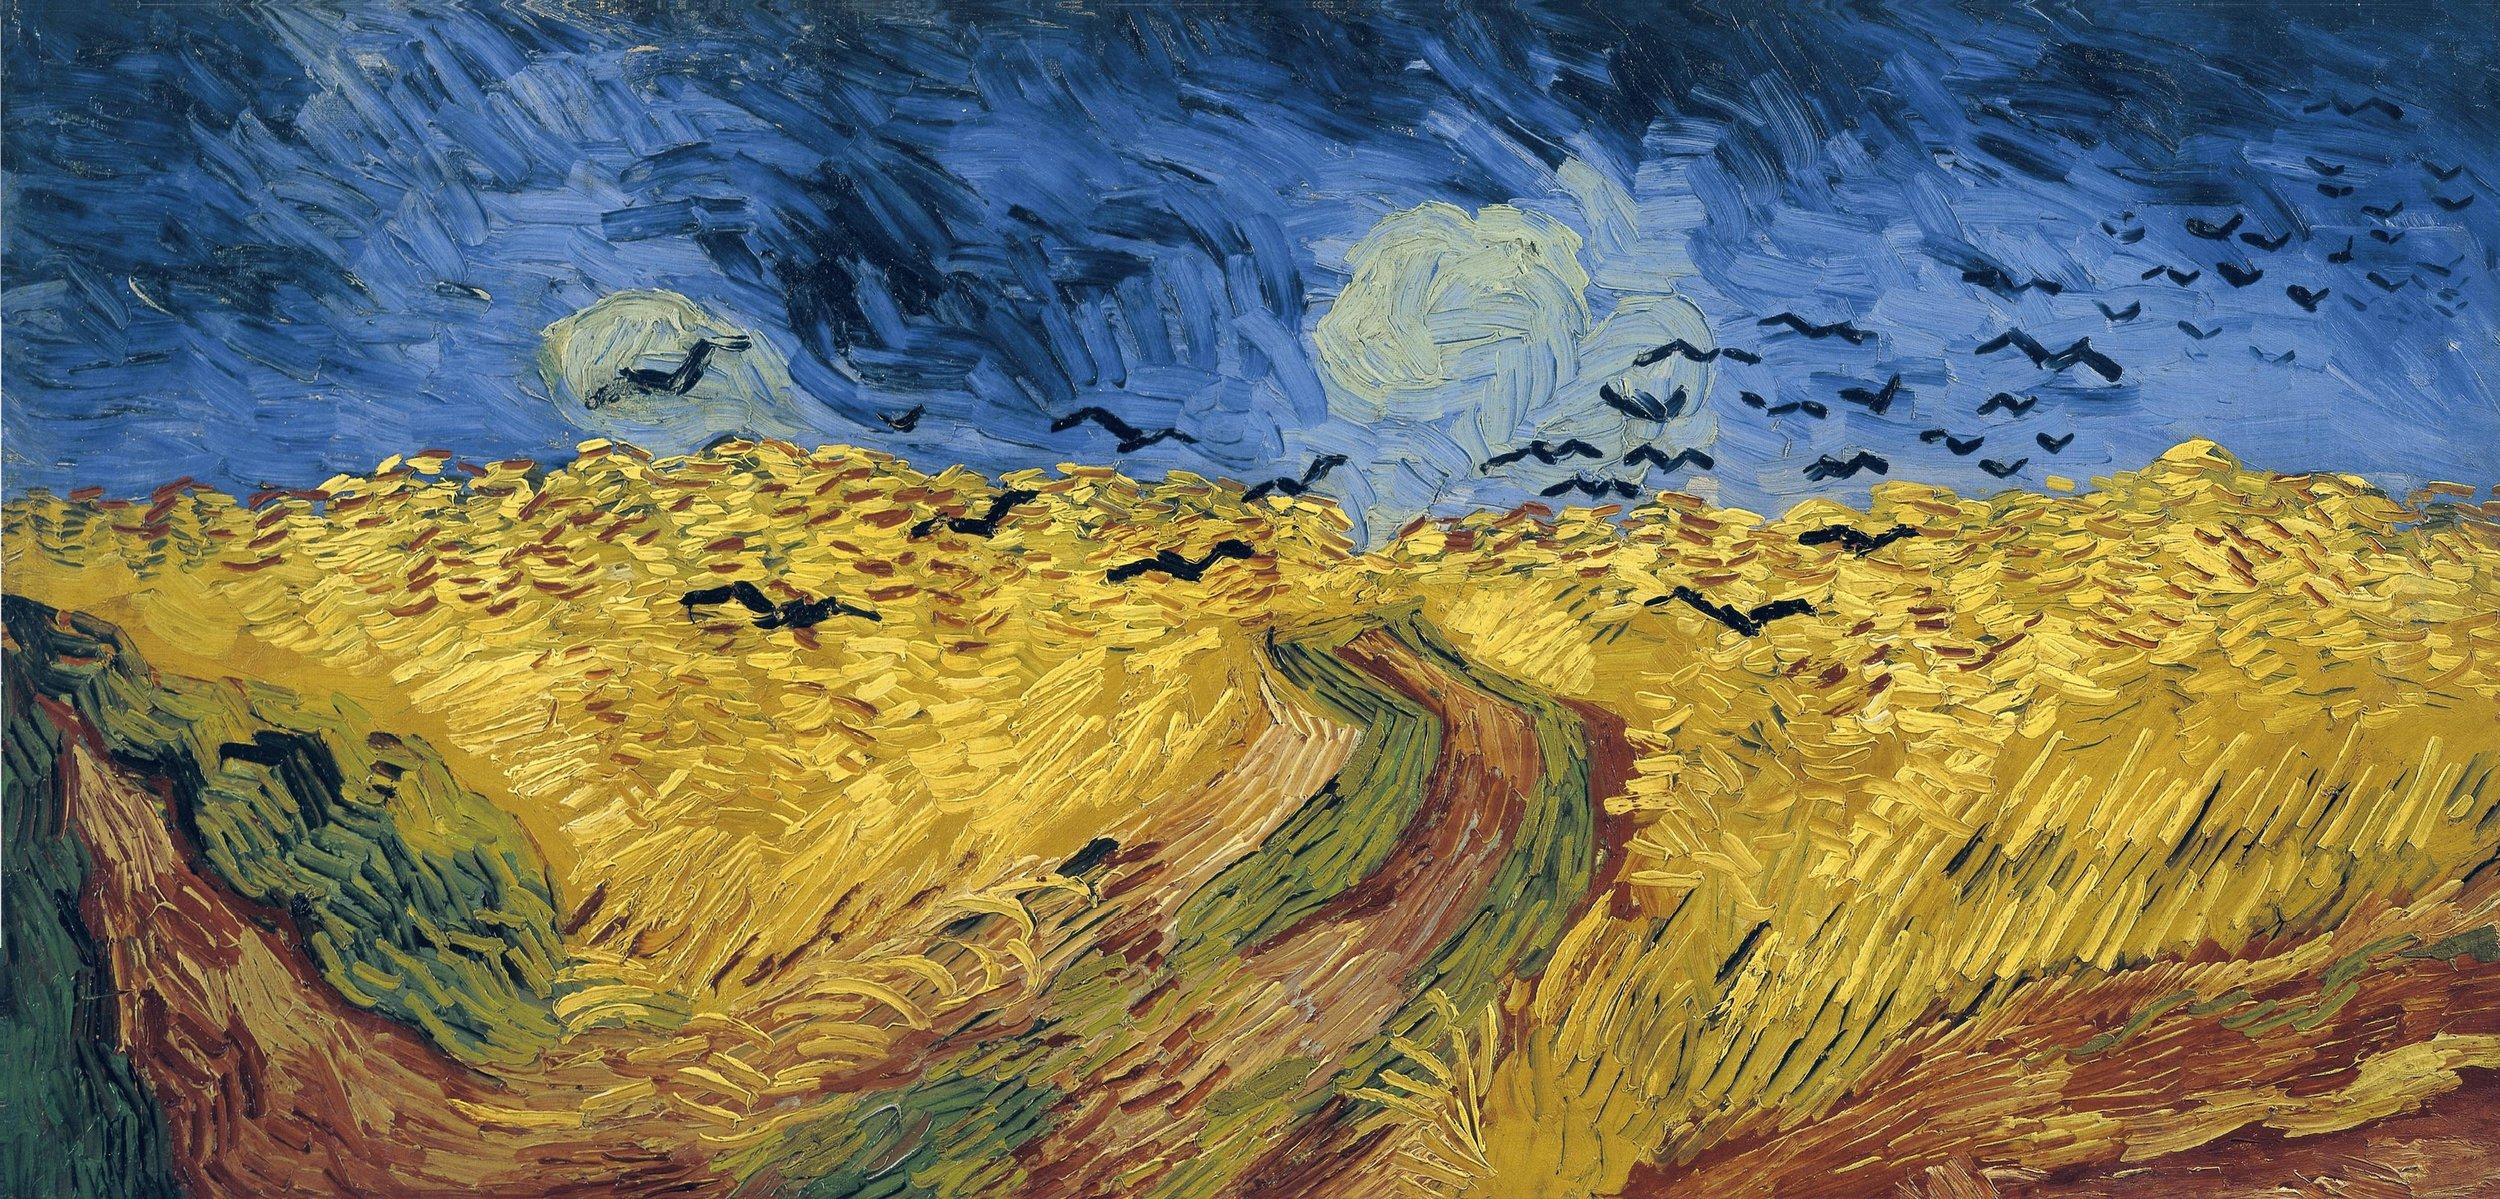 Mission-Hills-Christian-Church-Crows_In_A_Wheatfield_A_Vincent_Van_Gogh